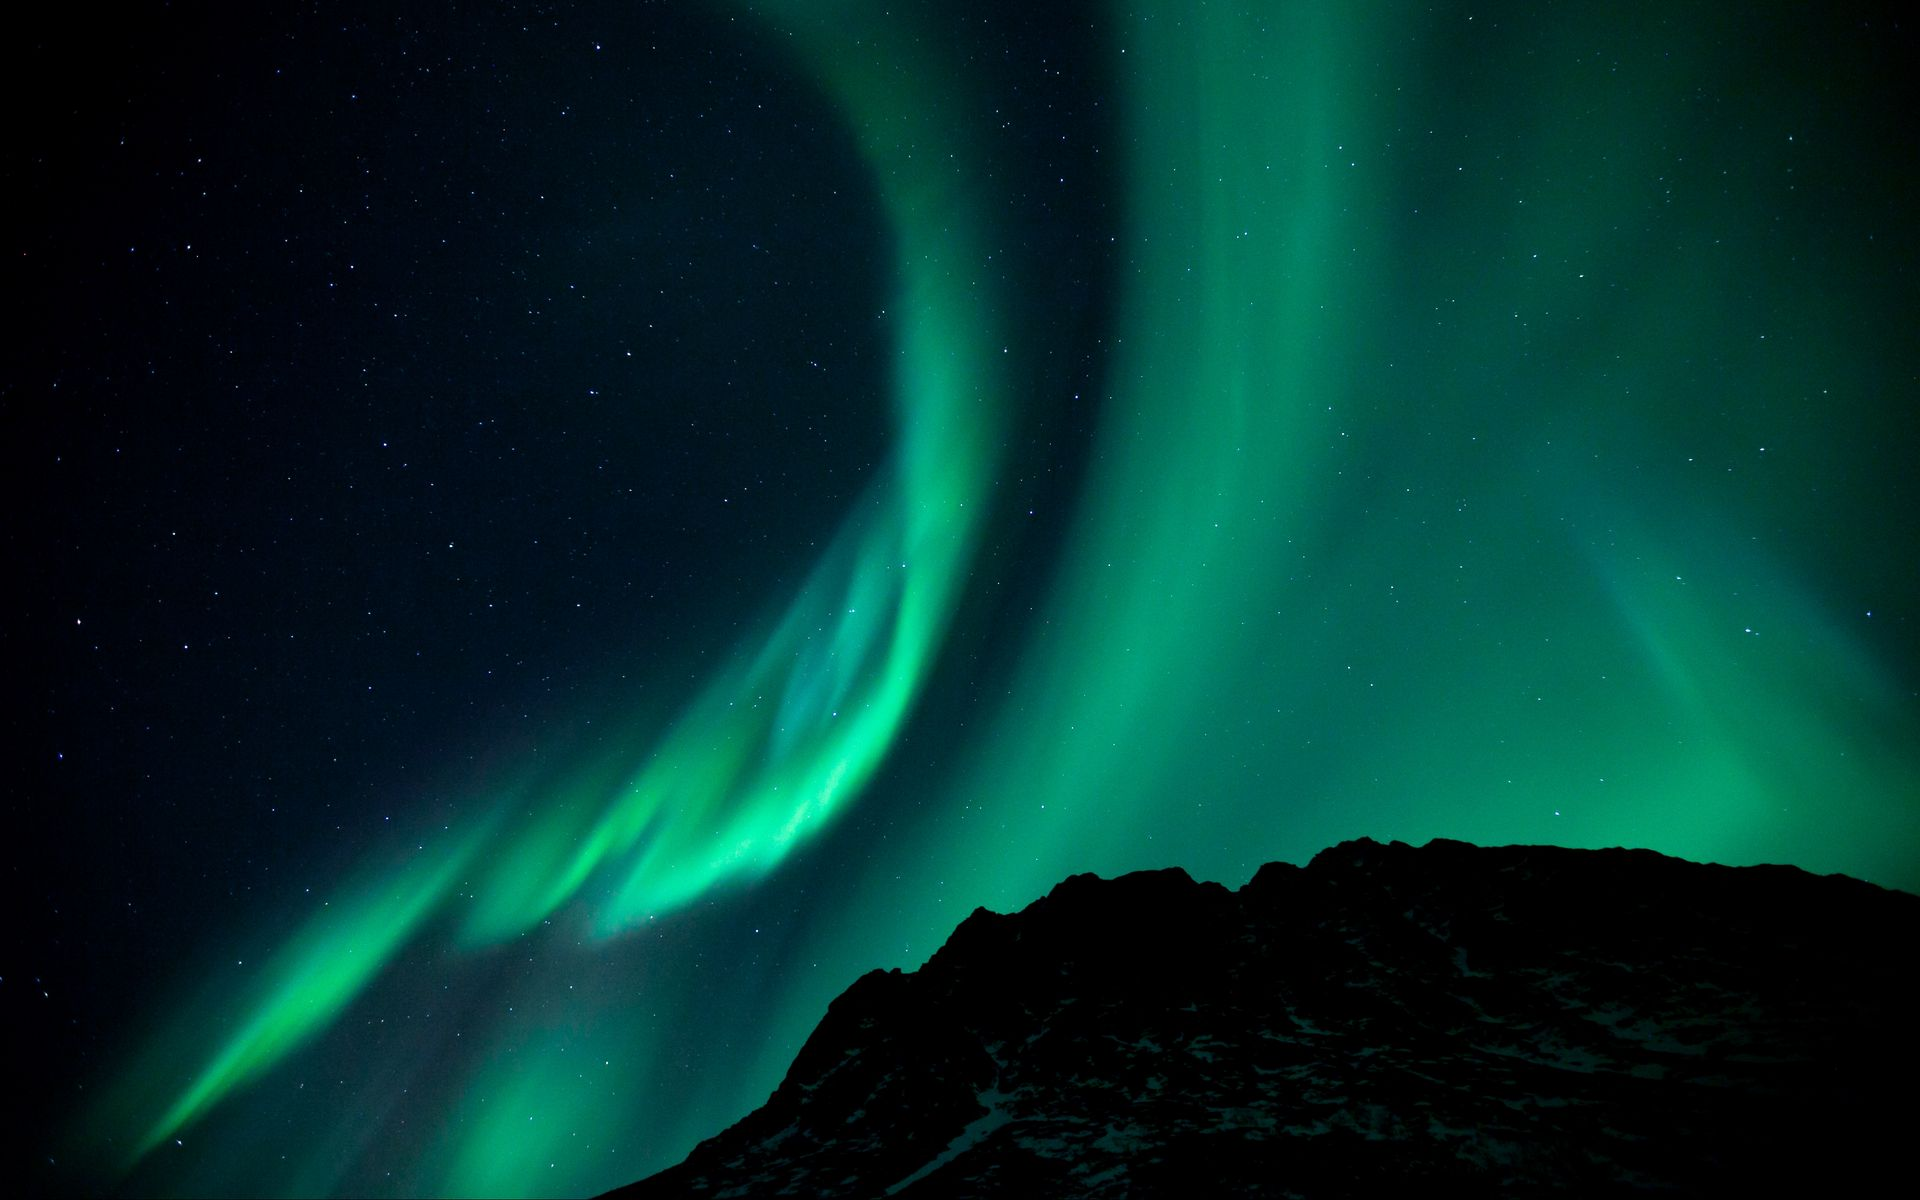 1920x1200 Wallpaper northern lights, night, night sky, phenomenon